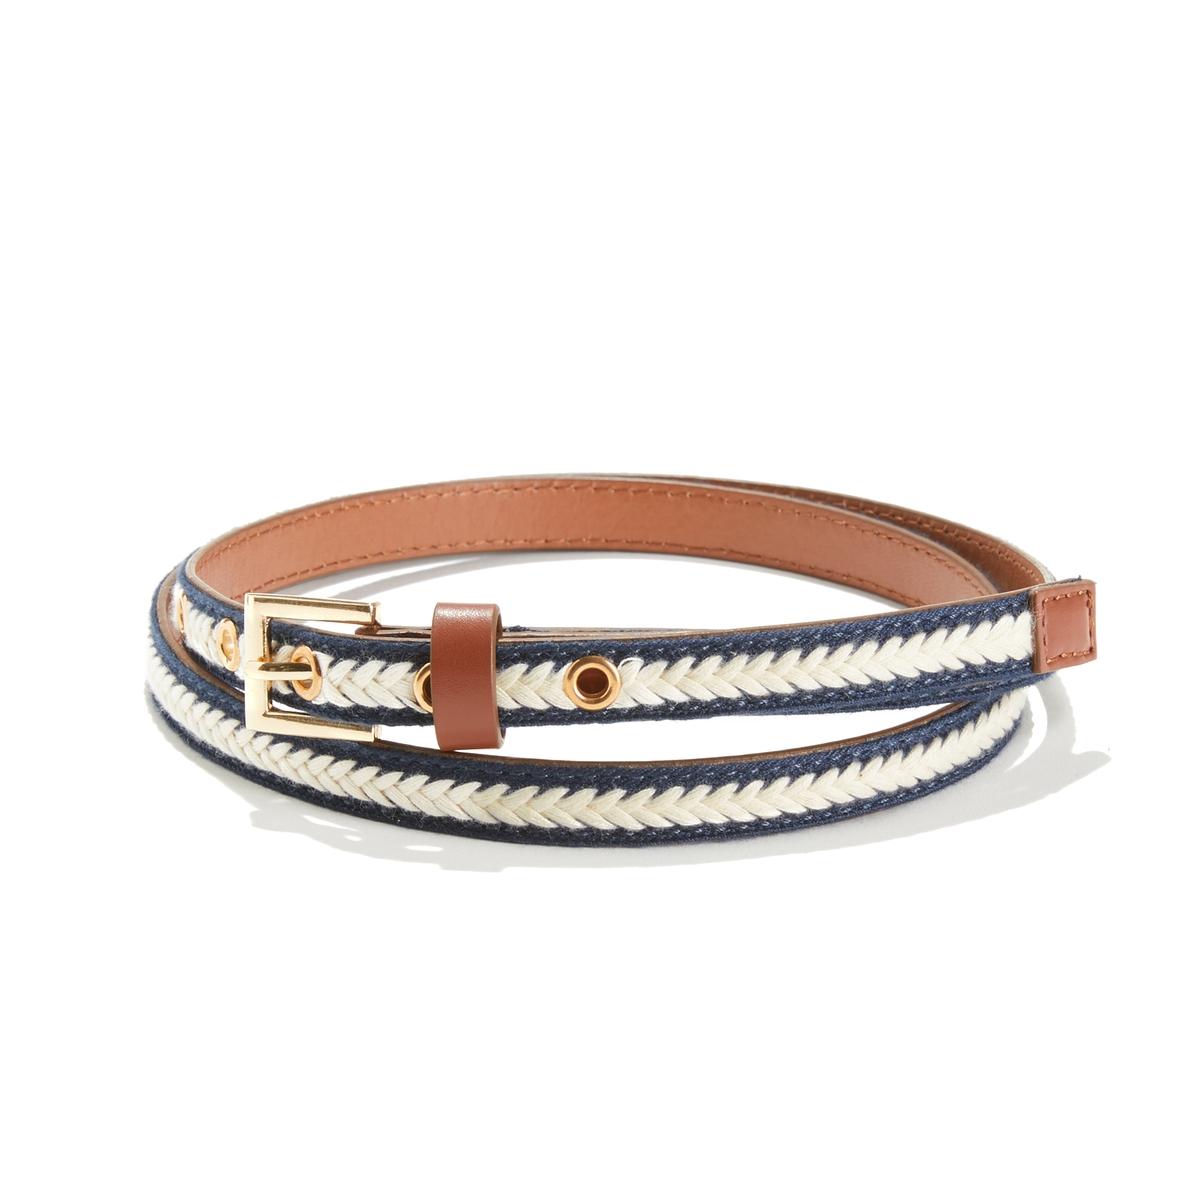 Cinturón con bordado fino